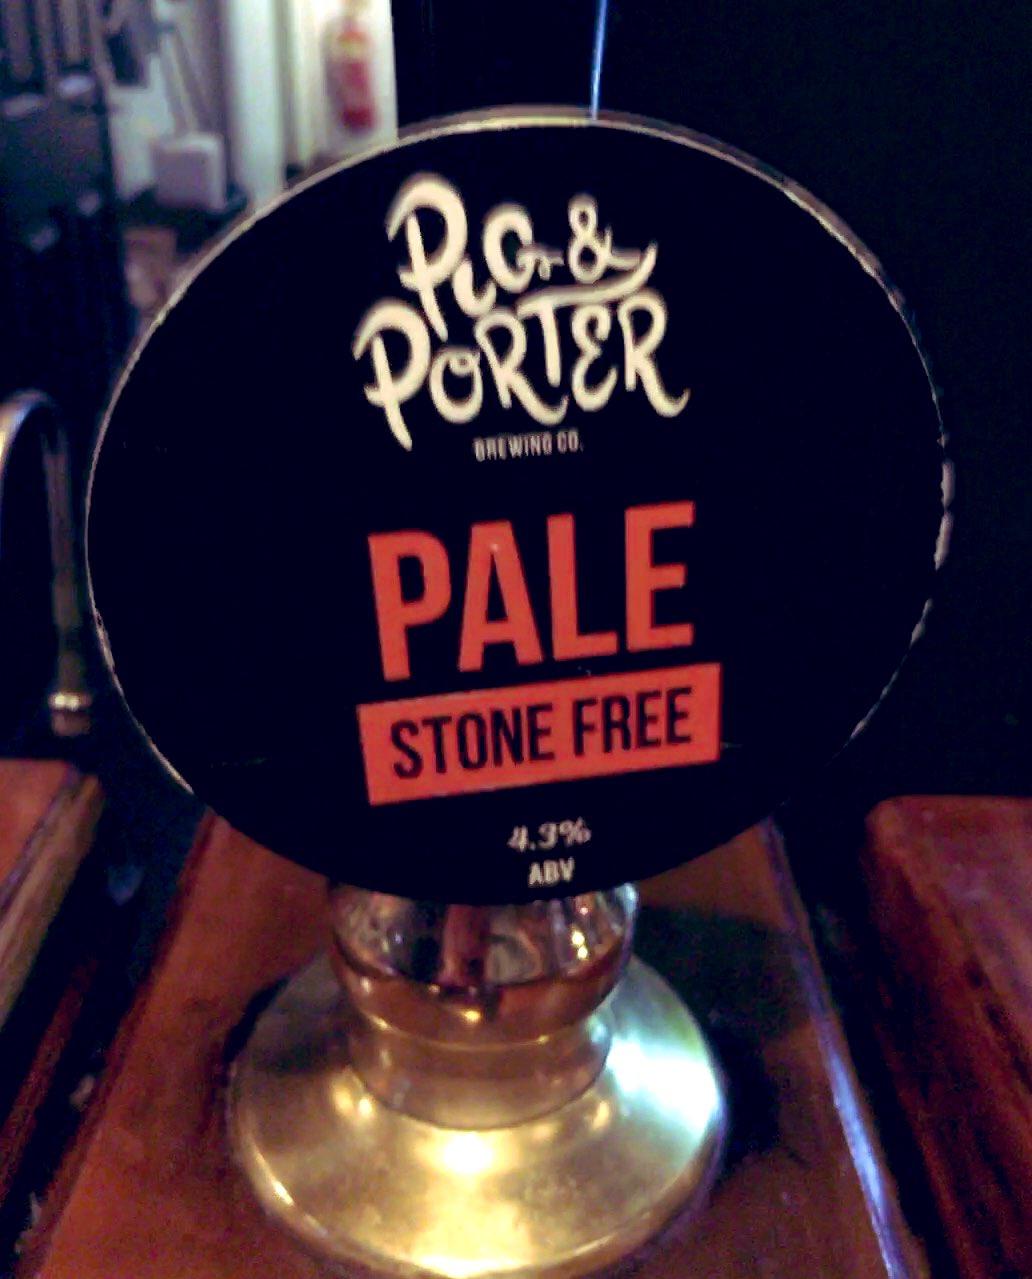 321: Stone Free